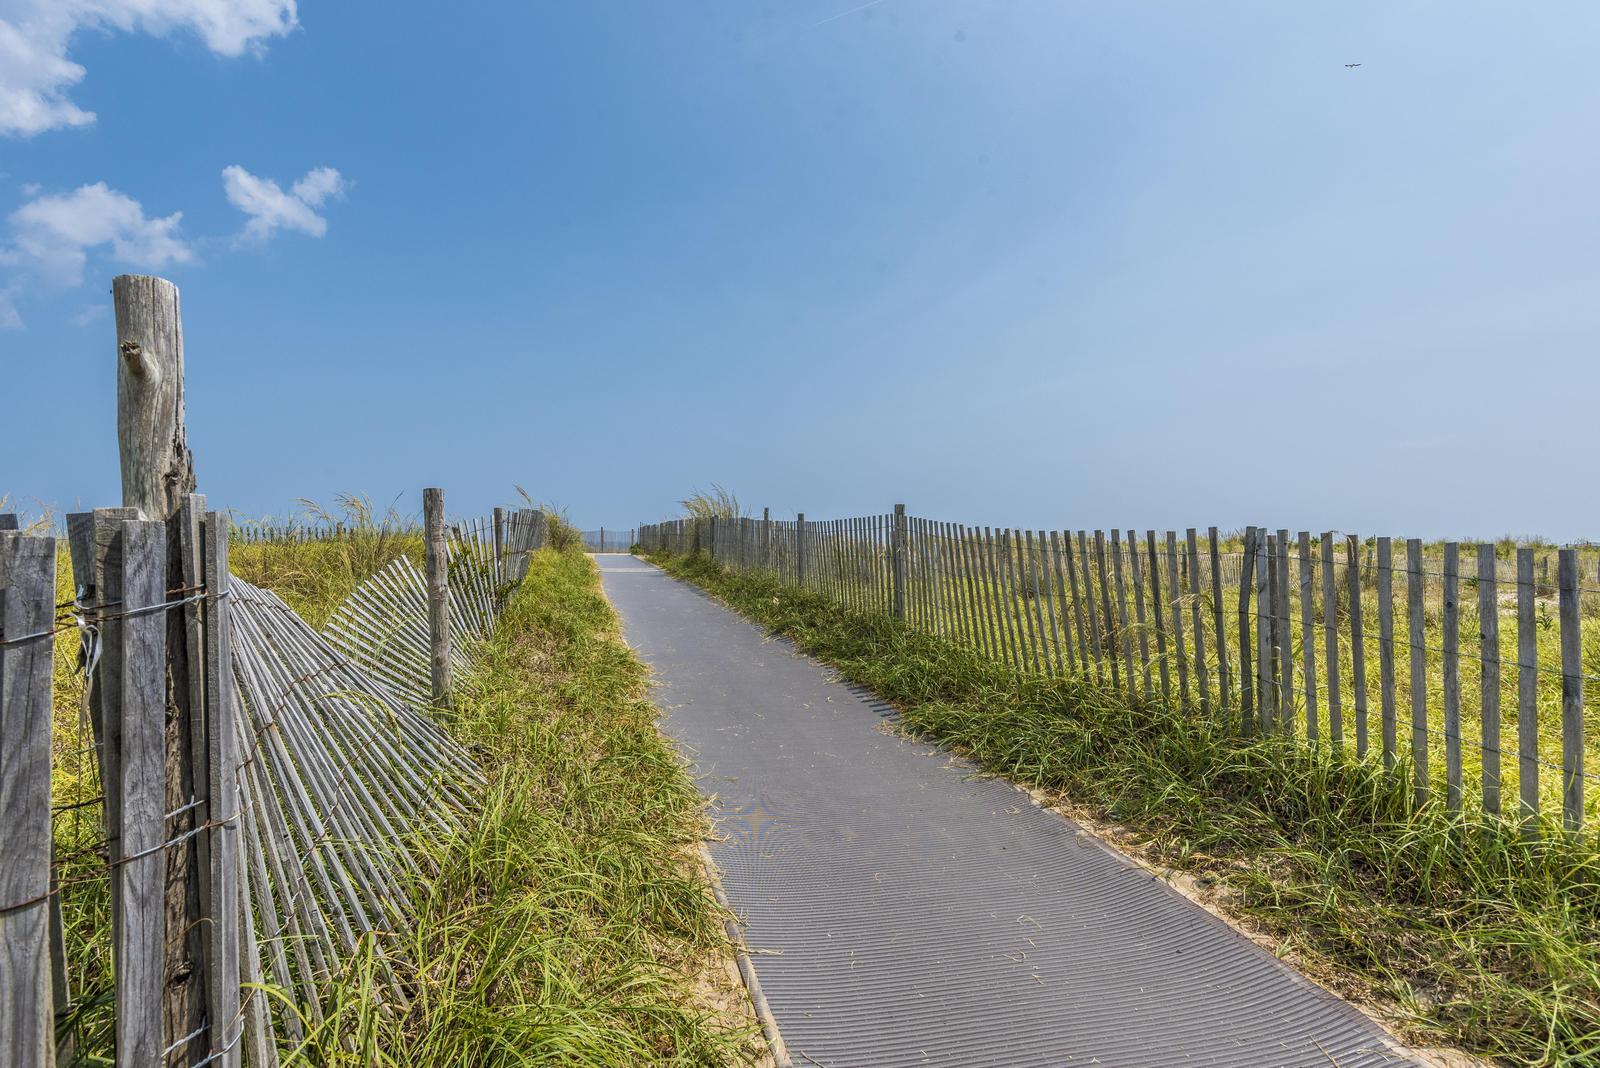 Bellevue Street beach path over dune